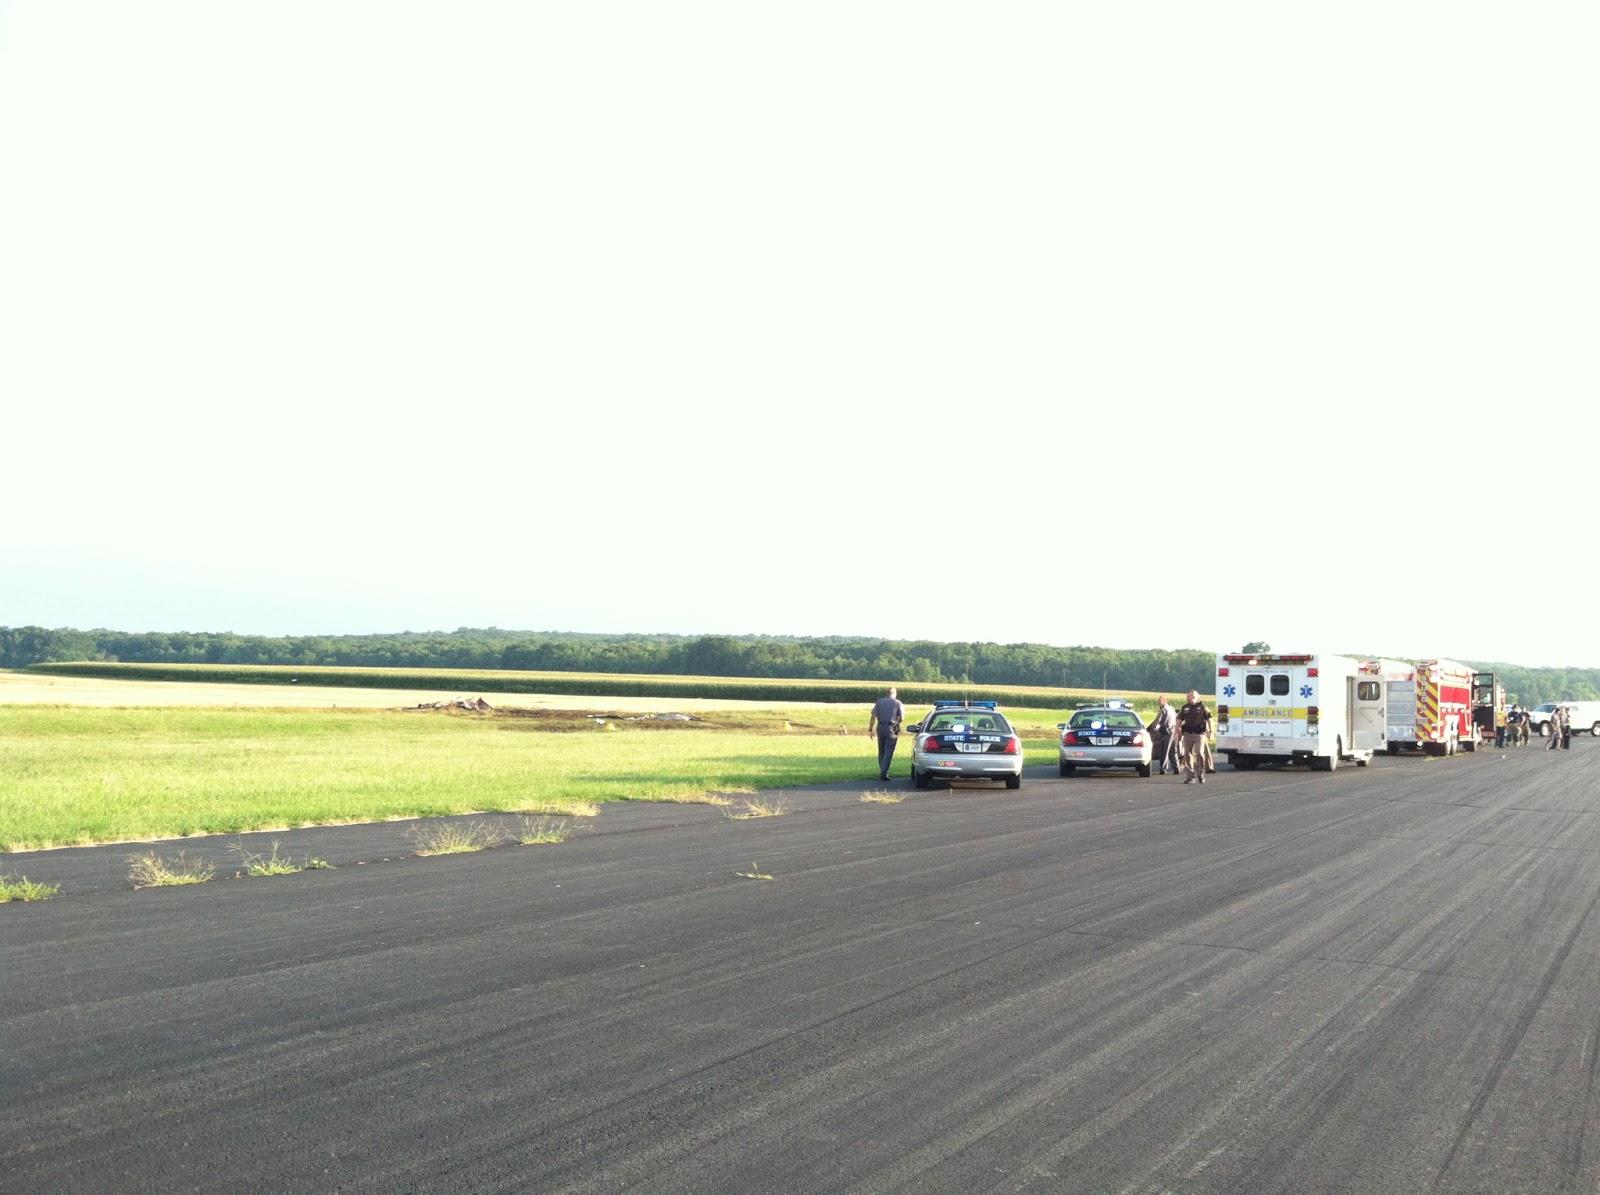 Kathryn's Report: Cessna 172M Skyhawk, JLS Aviation, N61954